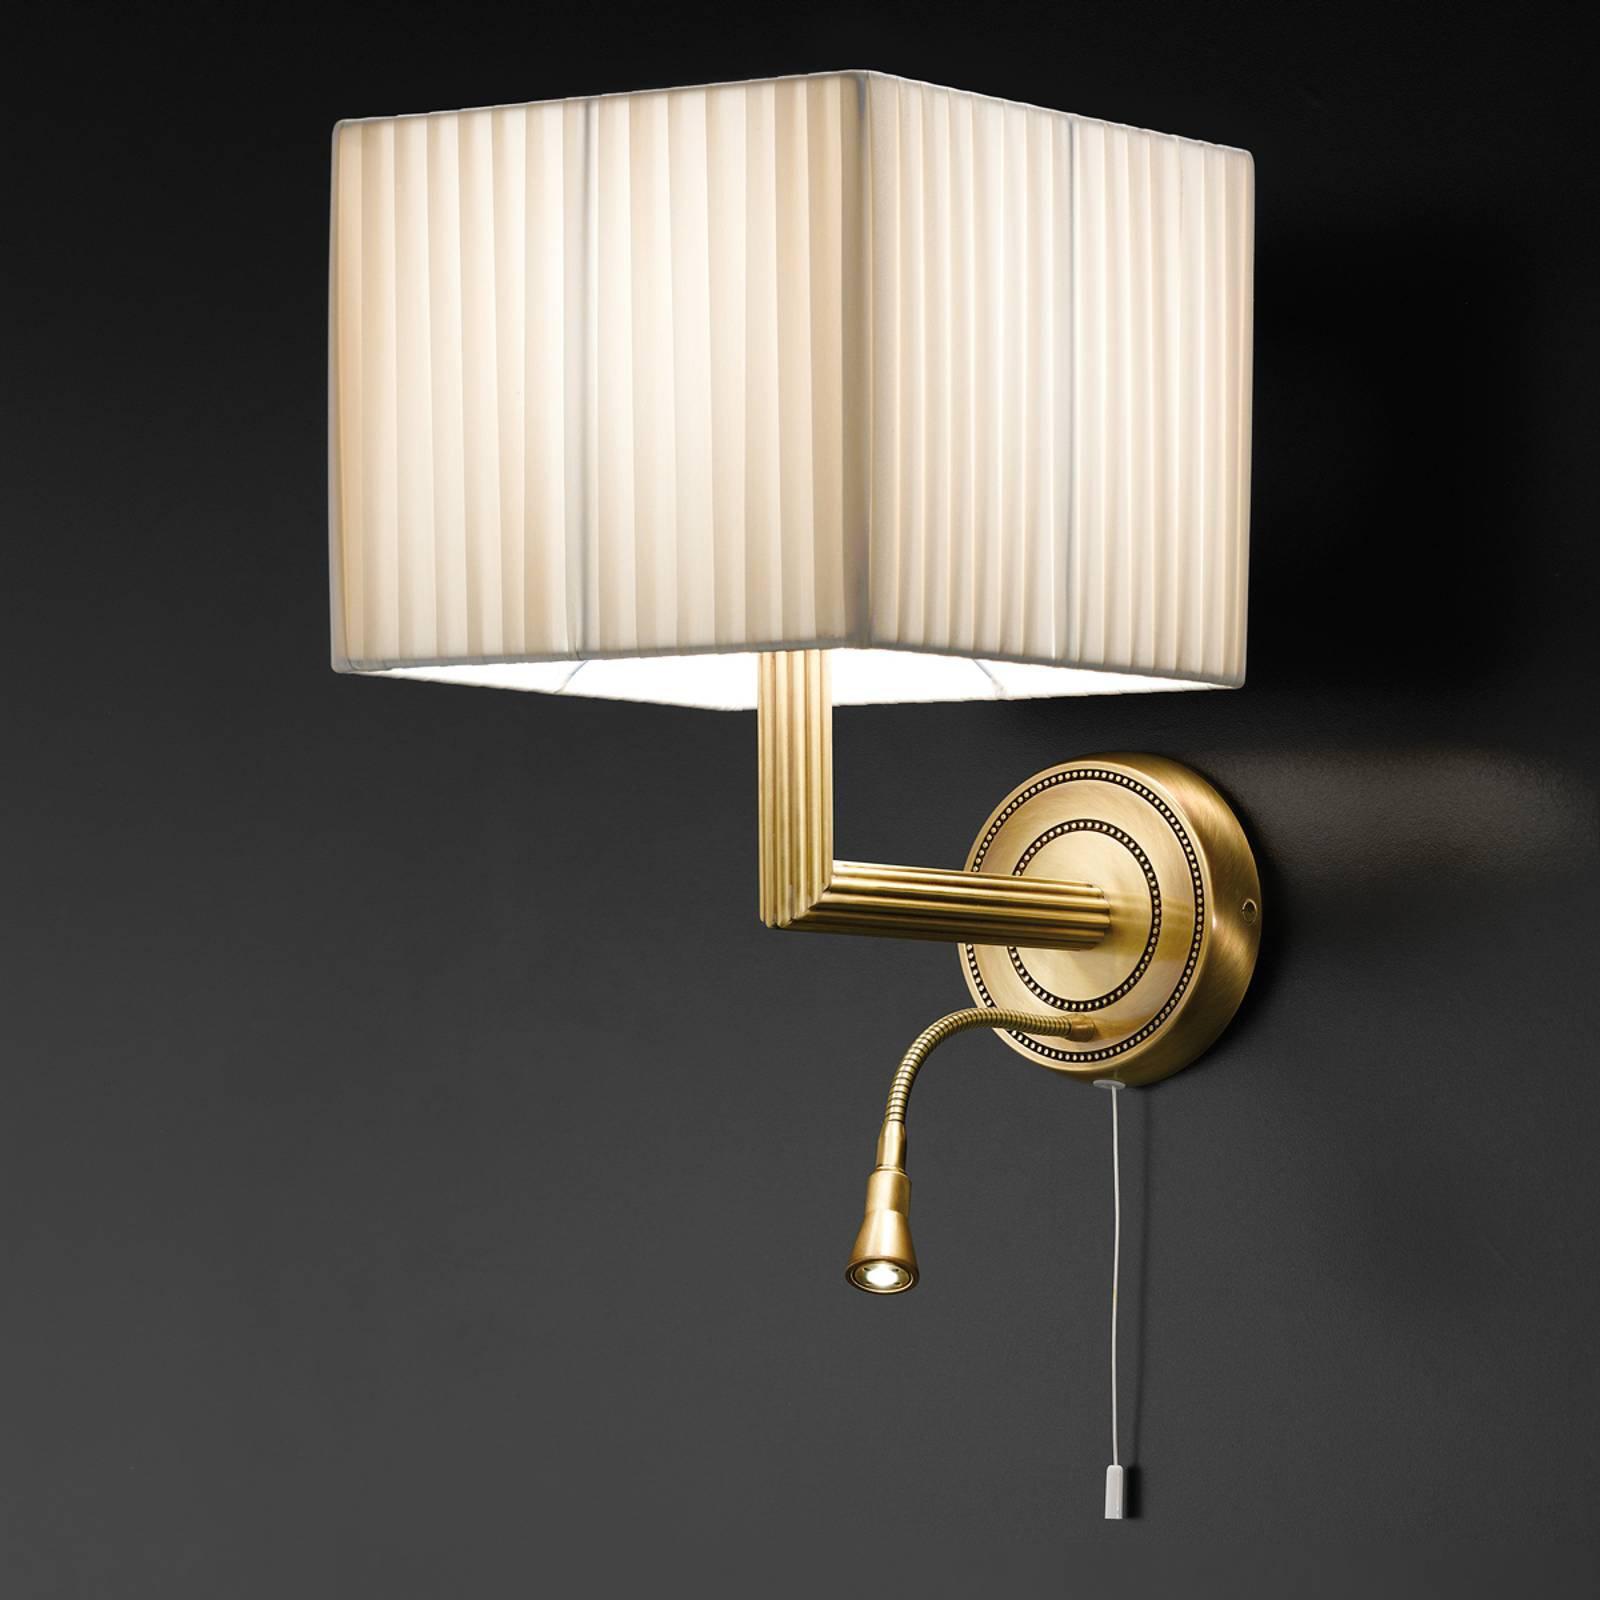 Vegglampe Imperial med LED-leselys